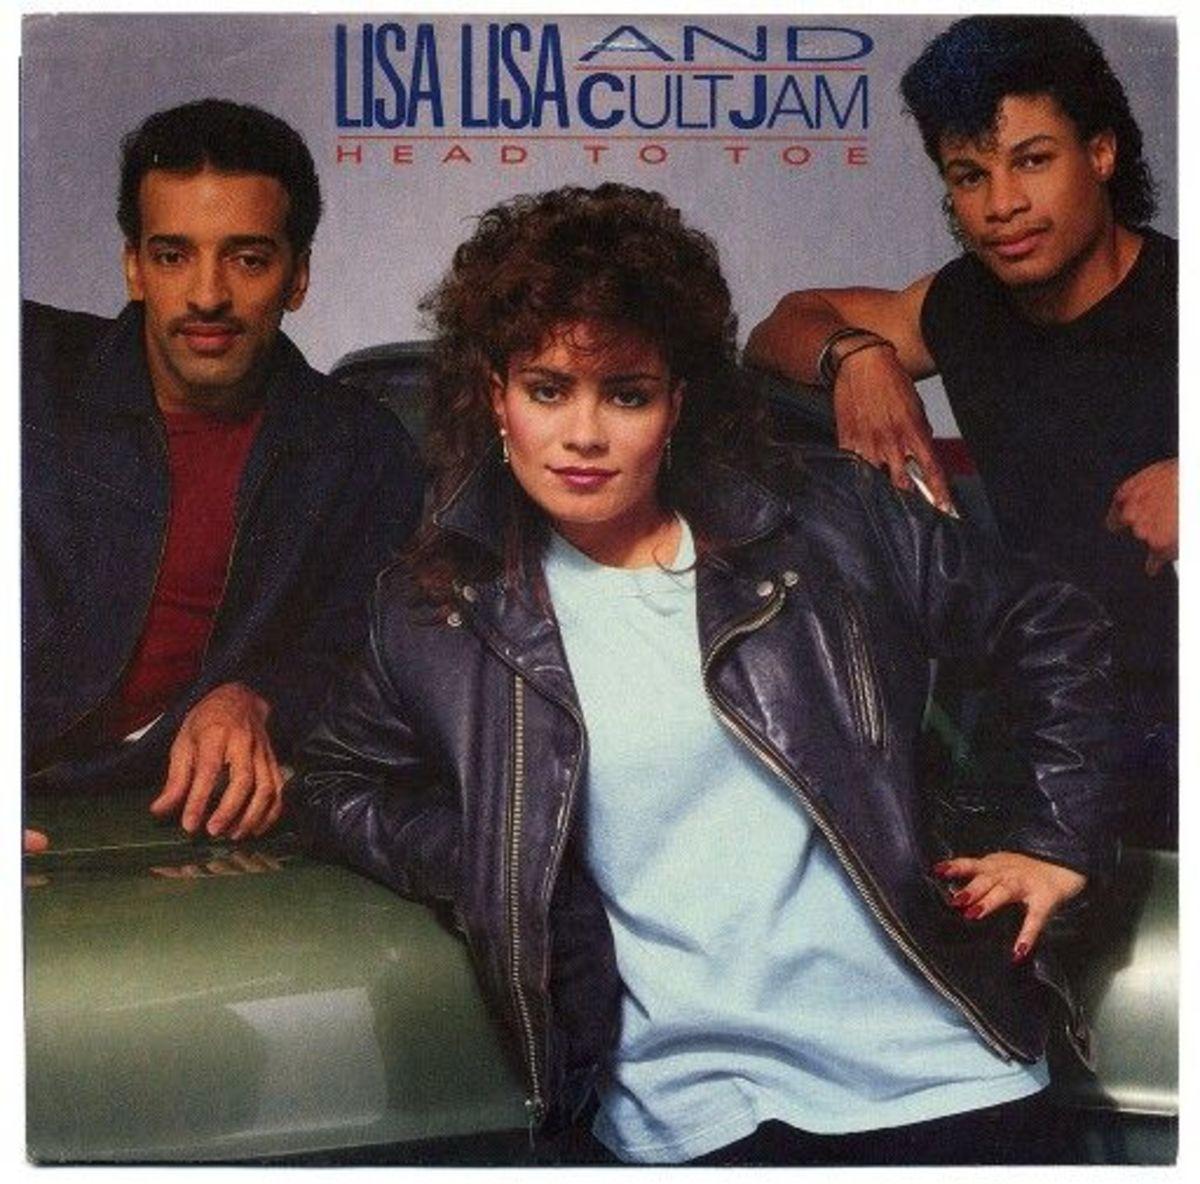 I really miss the 1980s.